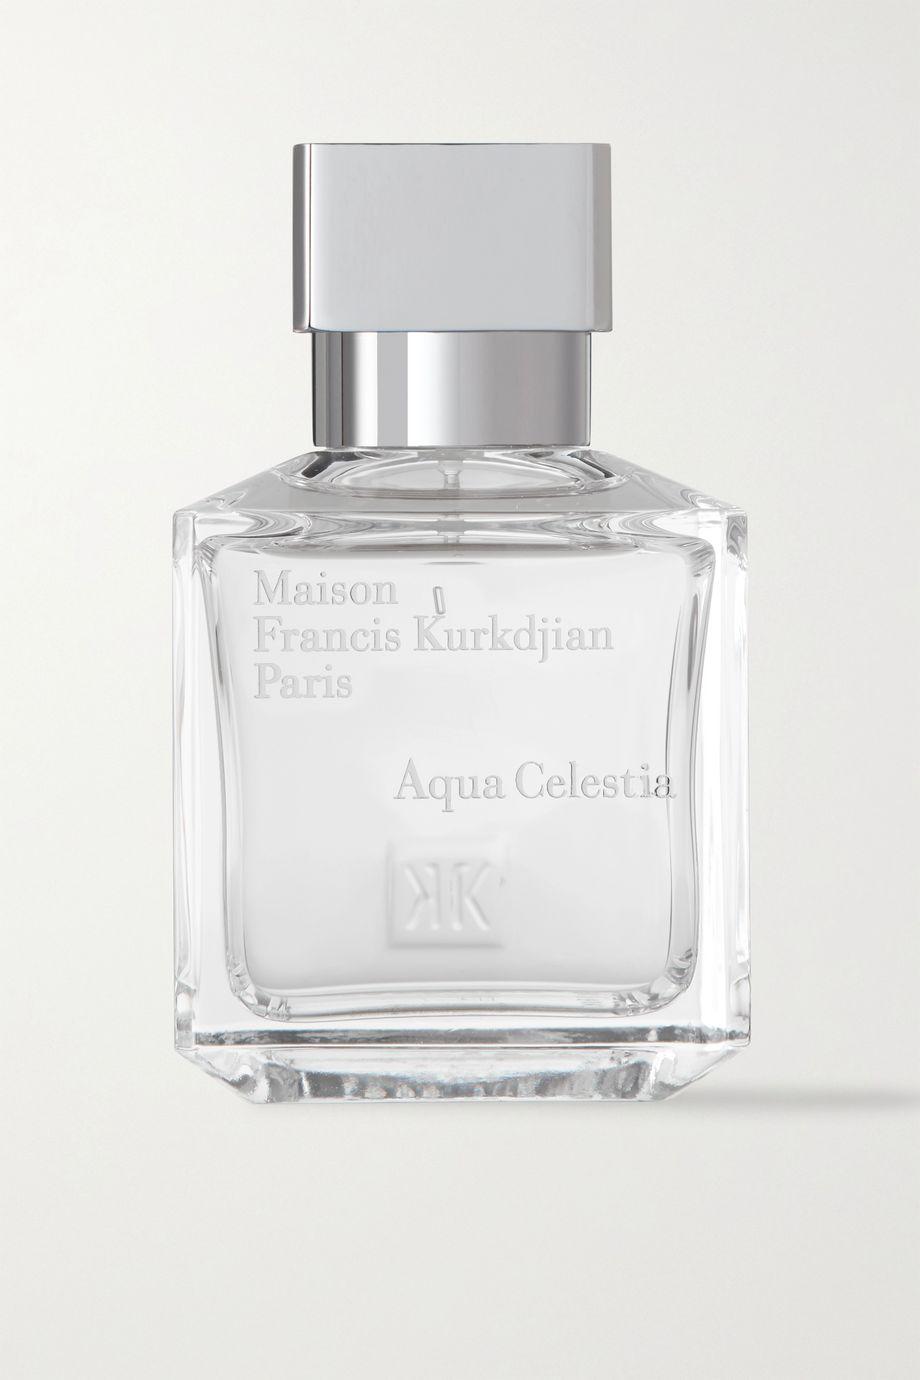 Maison Francis Kurkdjian Eau de Toilette - Aqua Celestia, 70ml